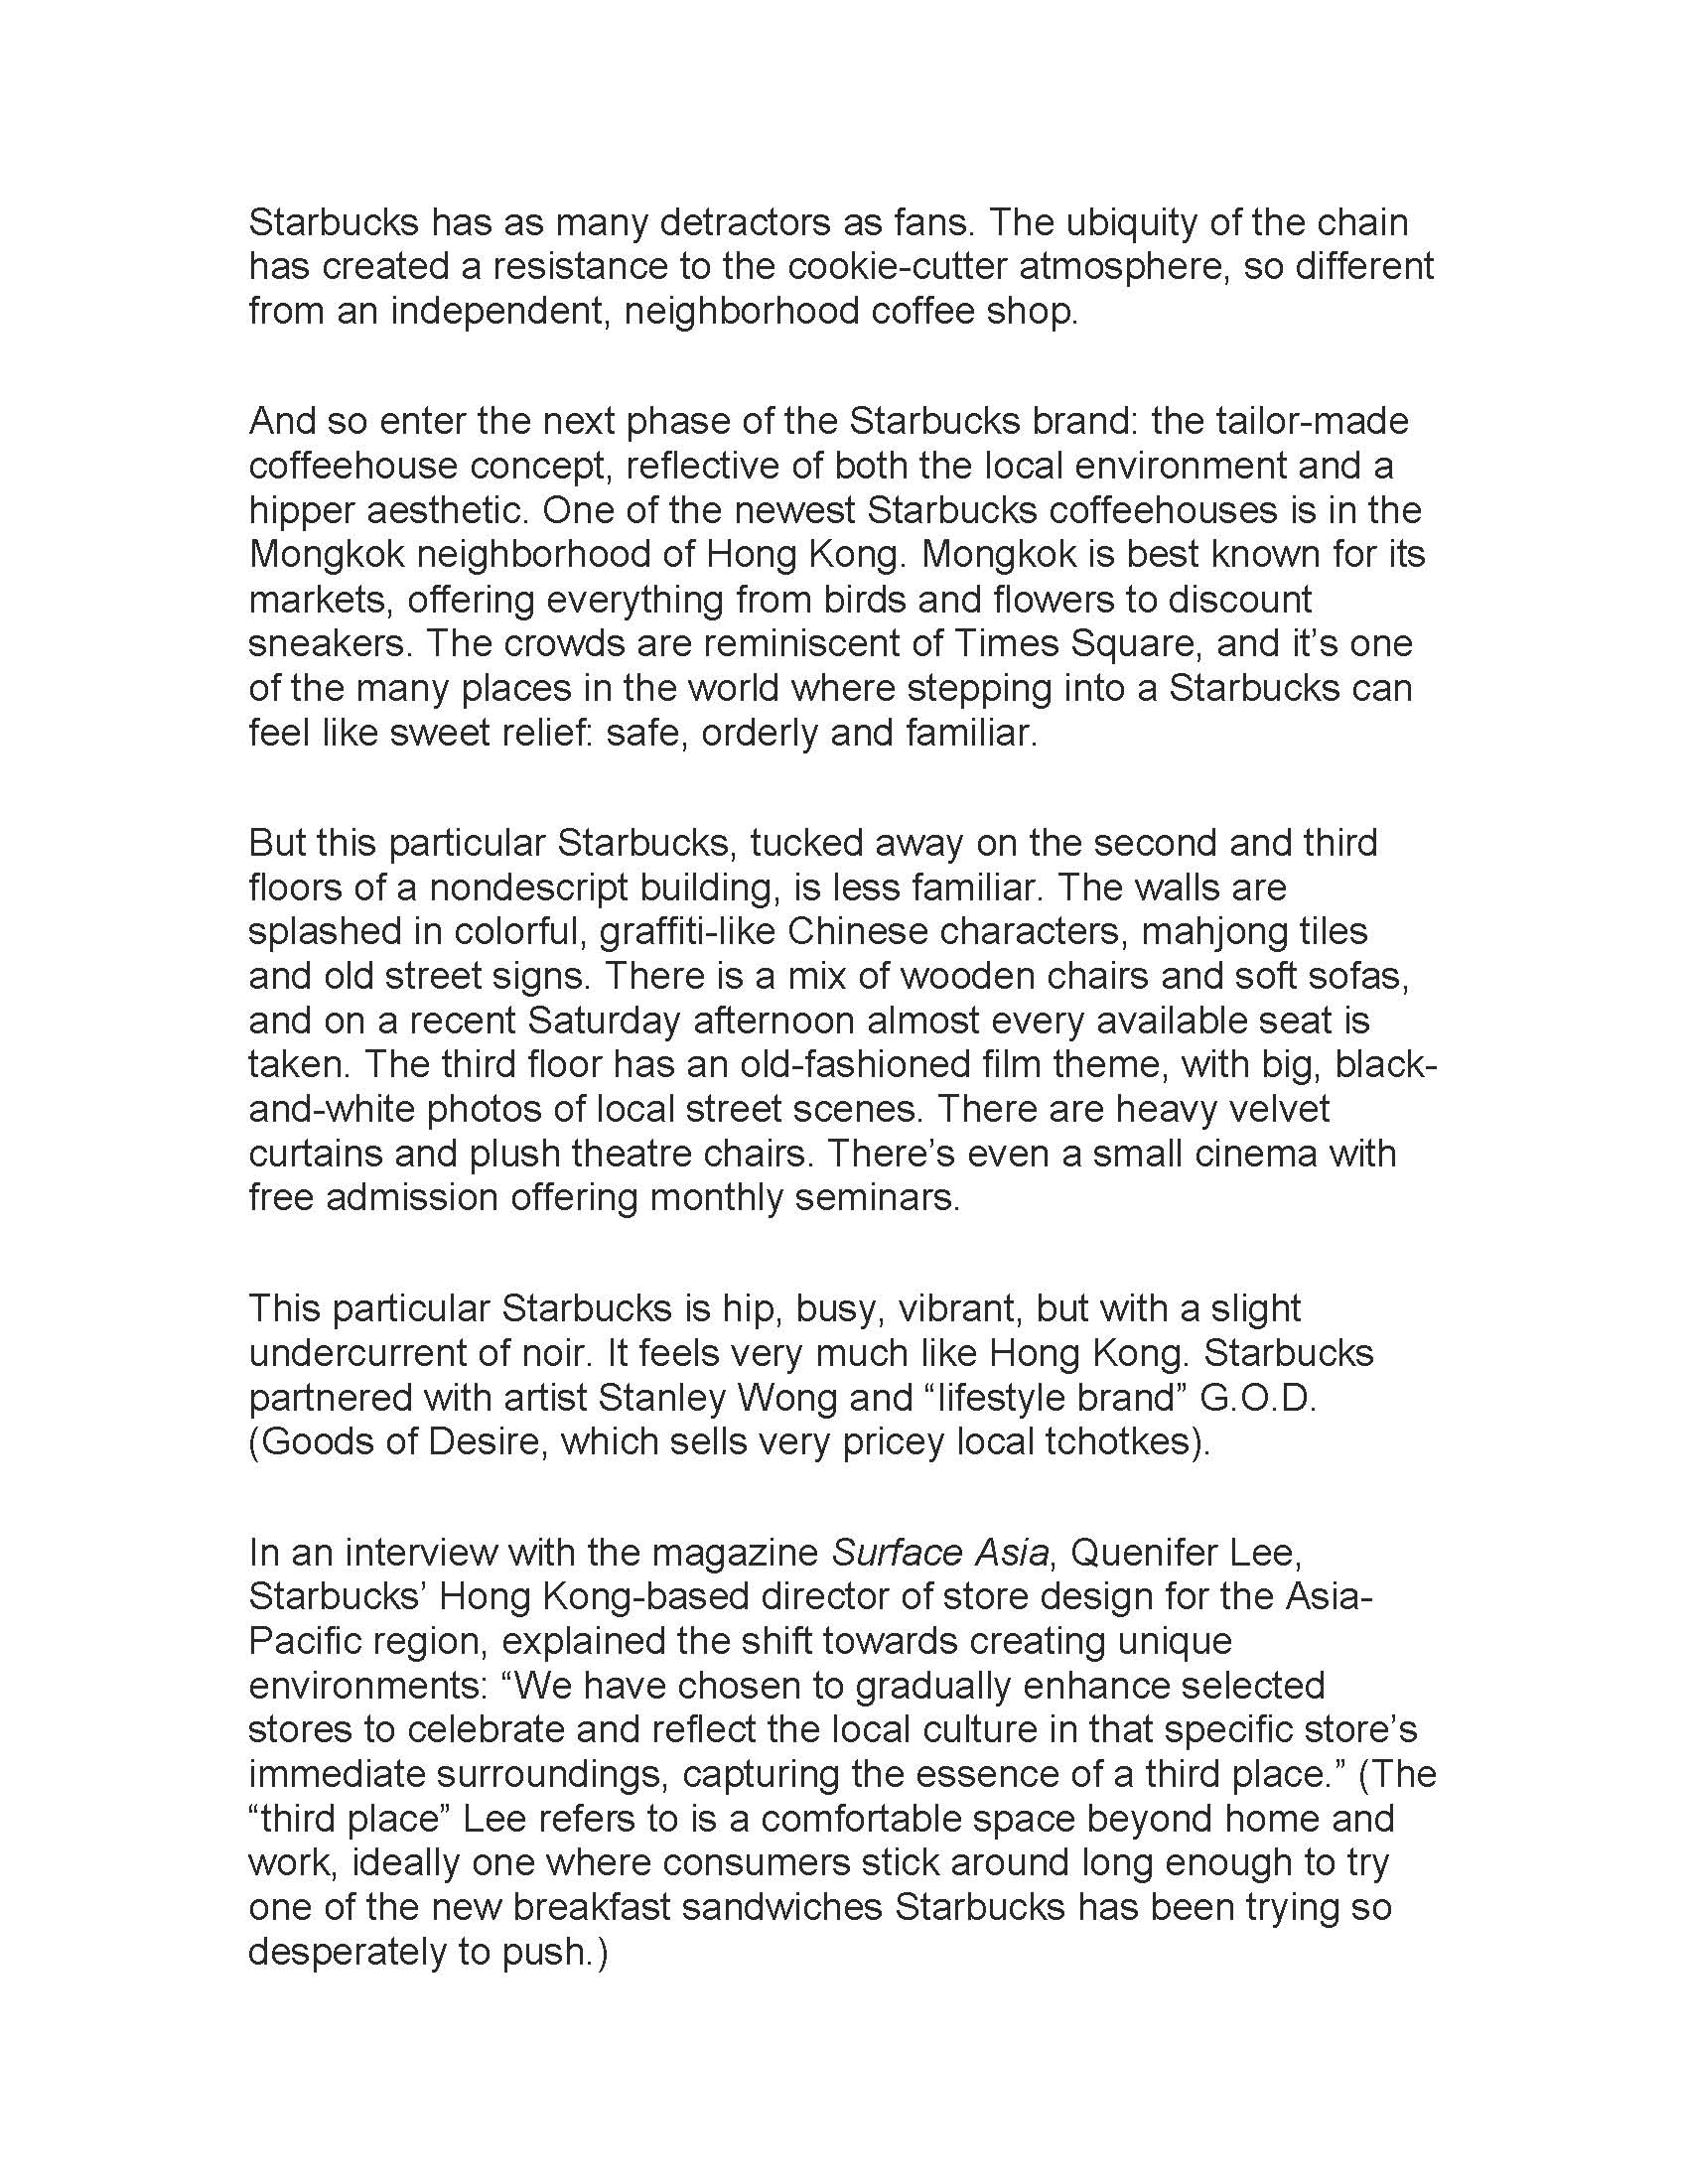 movie evaluation essay